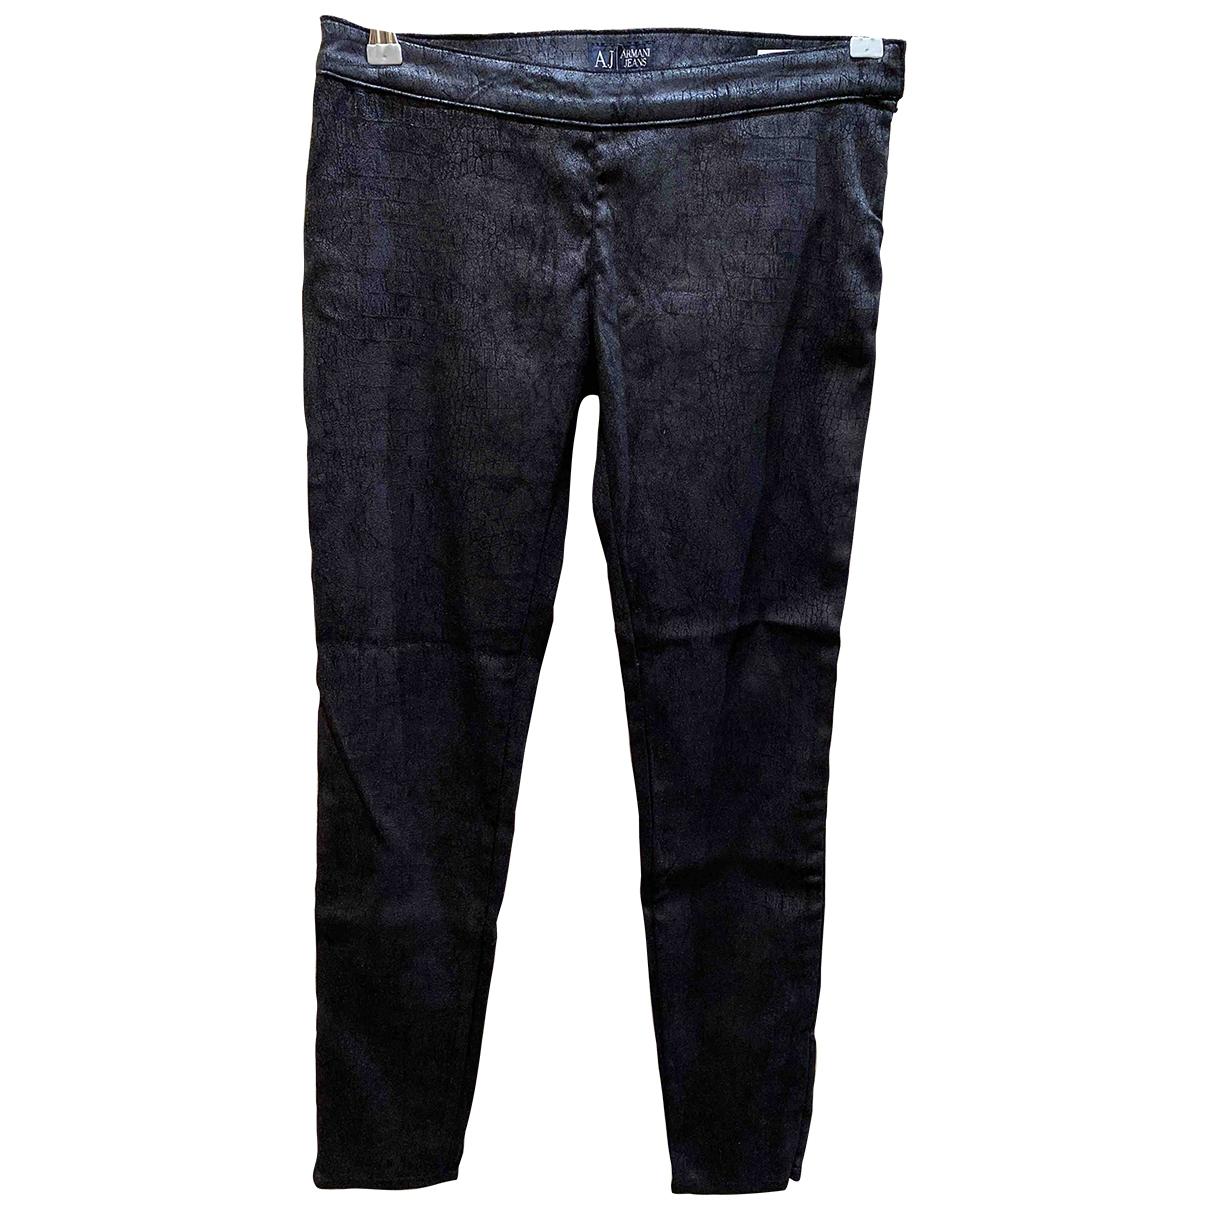 Armani Jeans \N Black Trousers for Women 40 IT